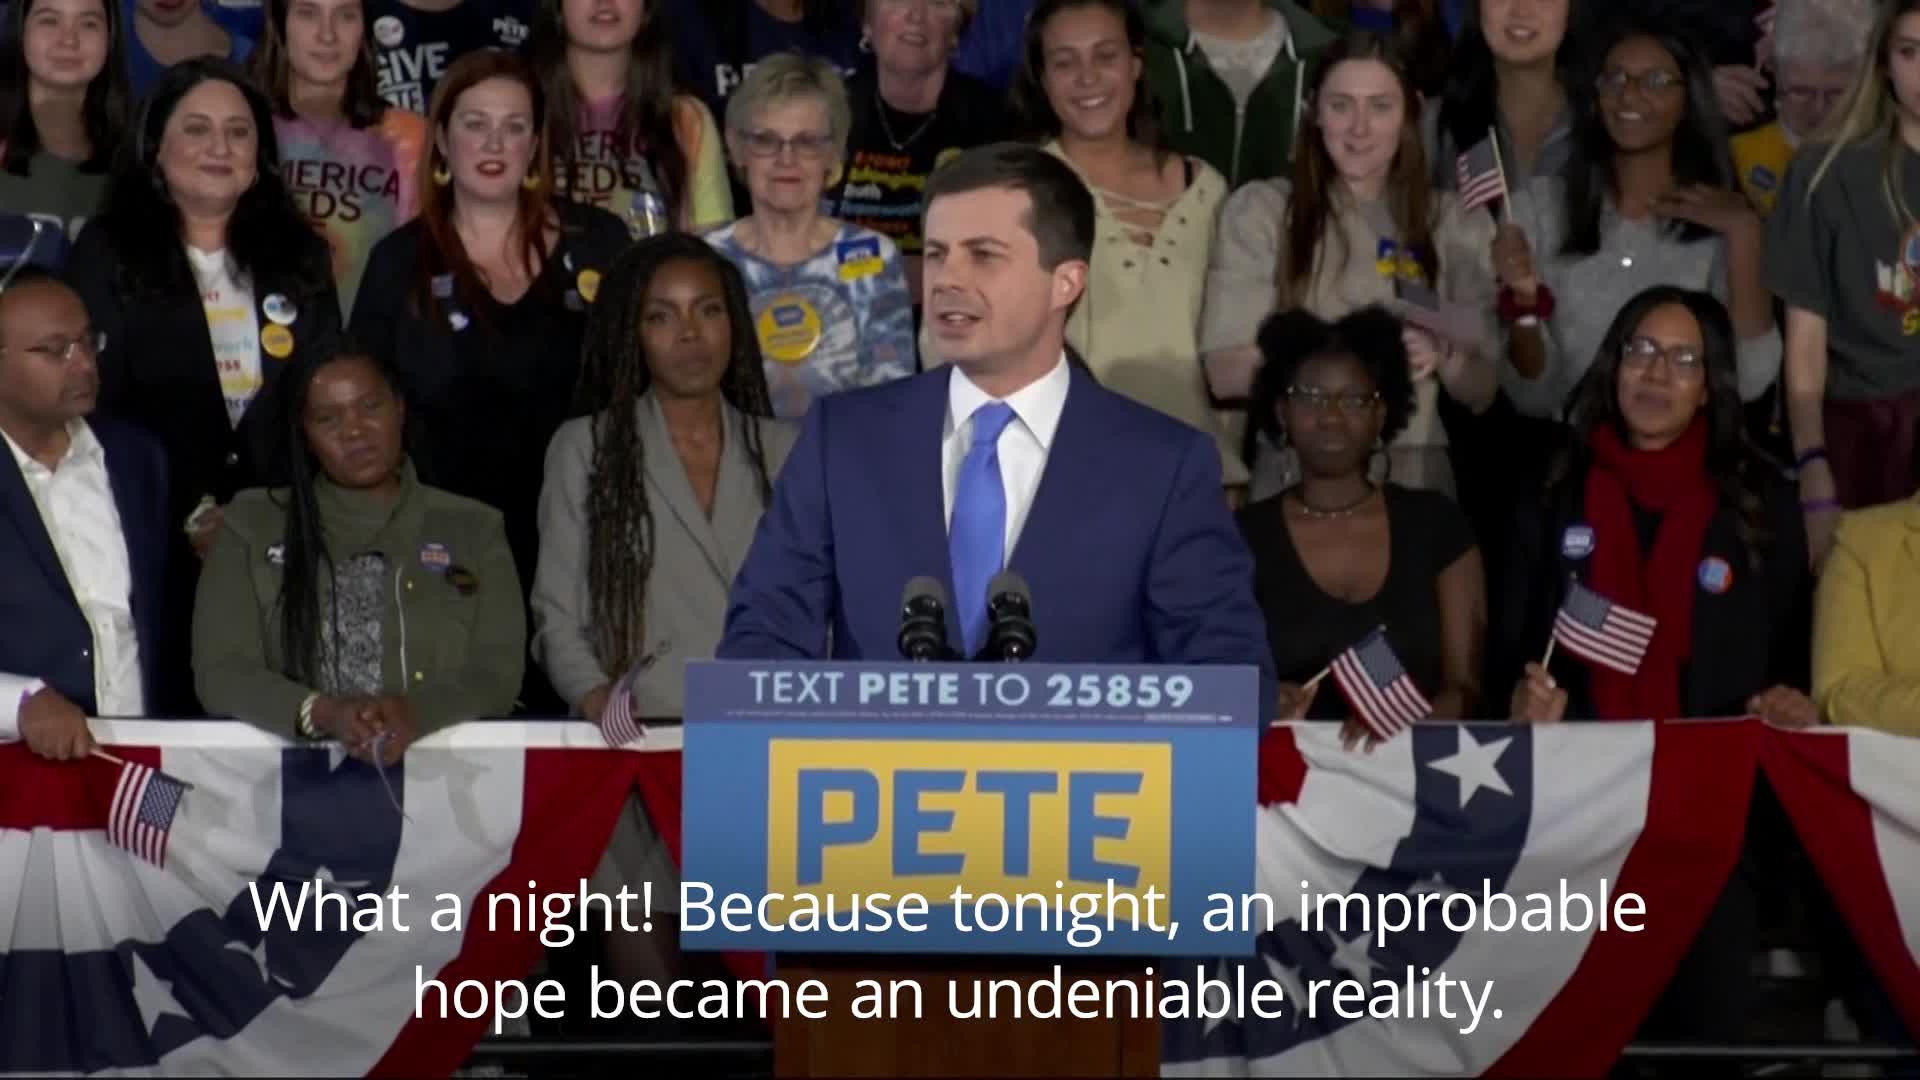 Pete Buttigieg backtracks on his victory speech from Iowa: 'Something extraordinary had happened'